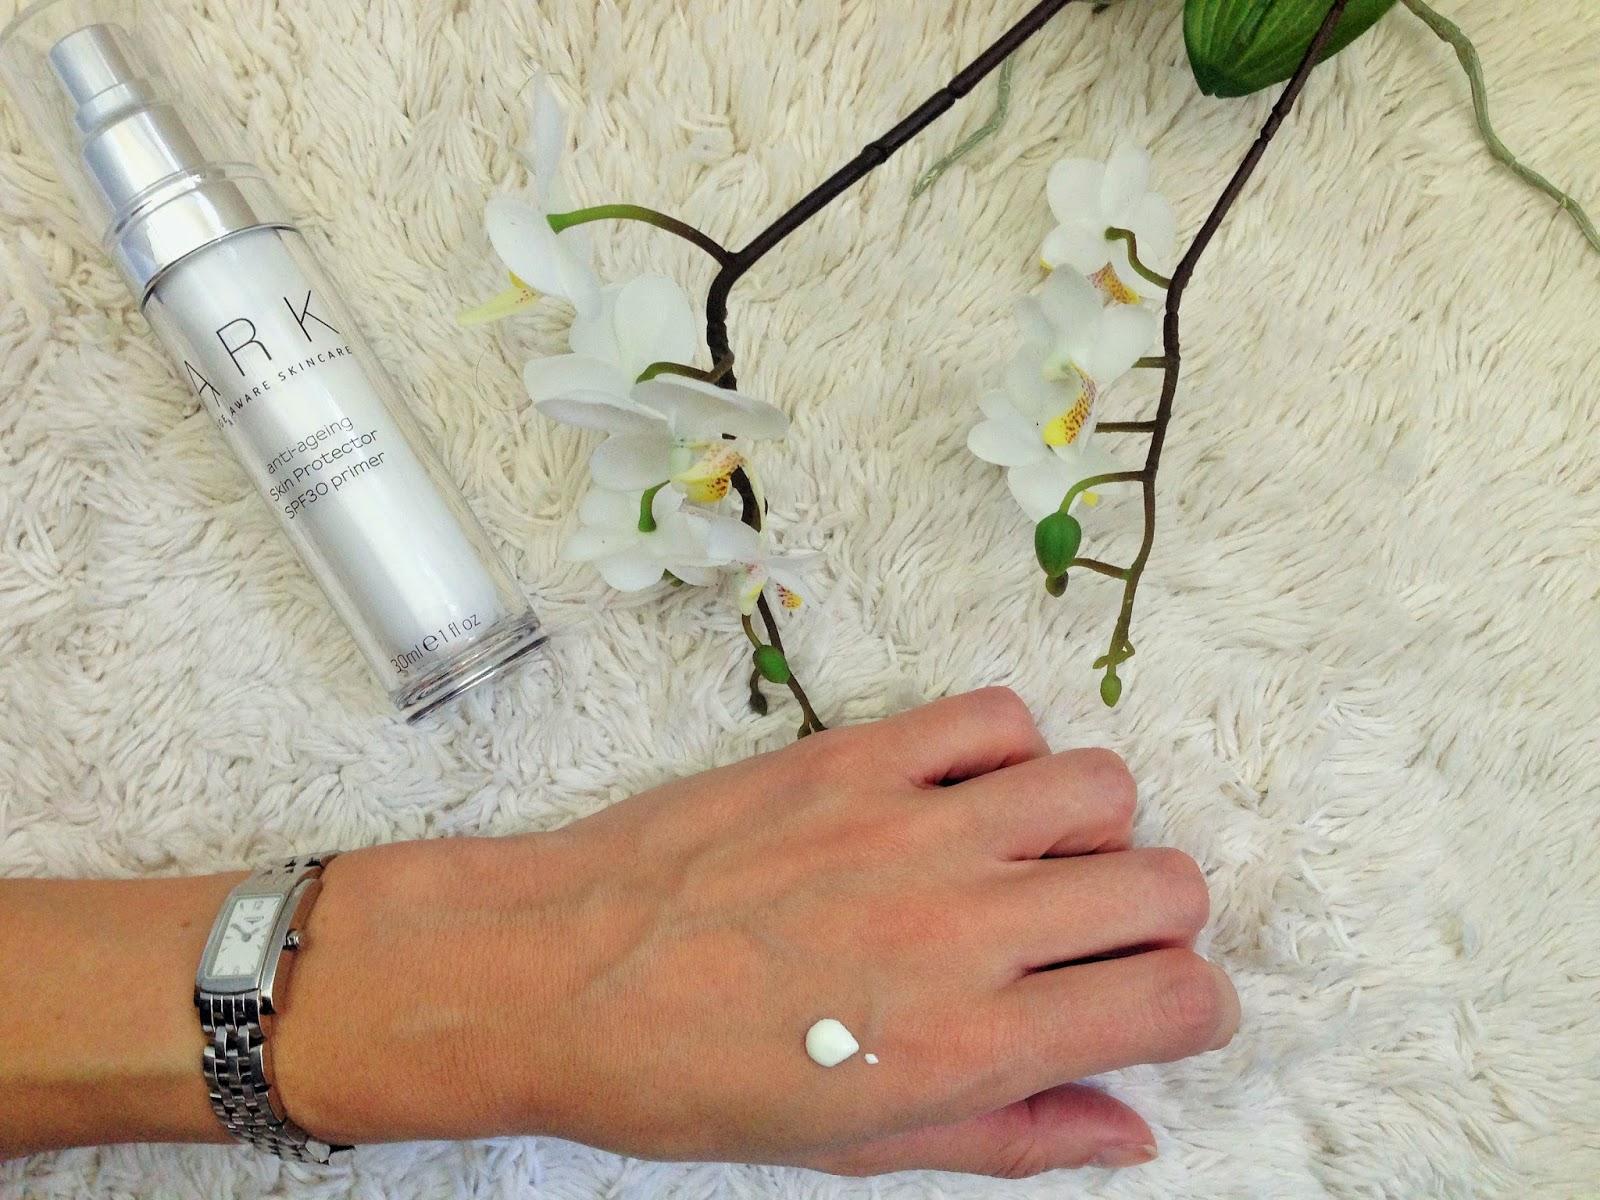 Ark Skincare Anti-Ageing Skin Protector SPF 30 Primer